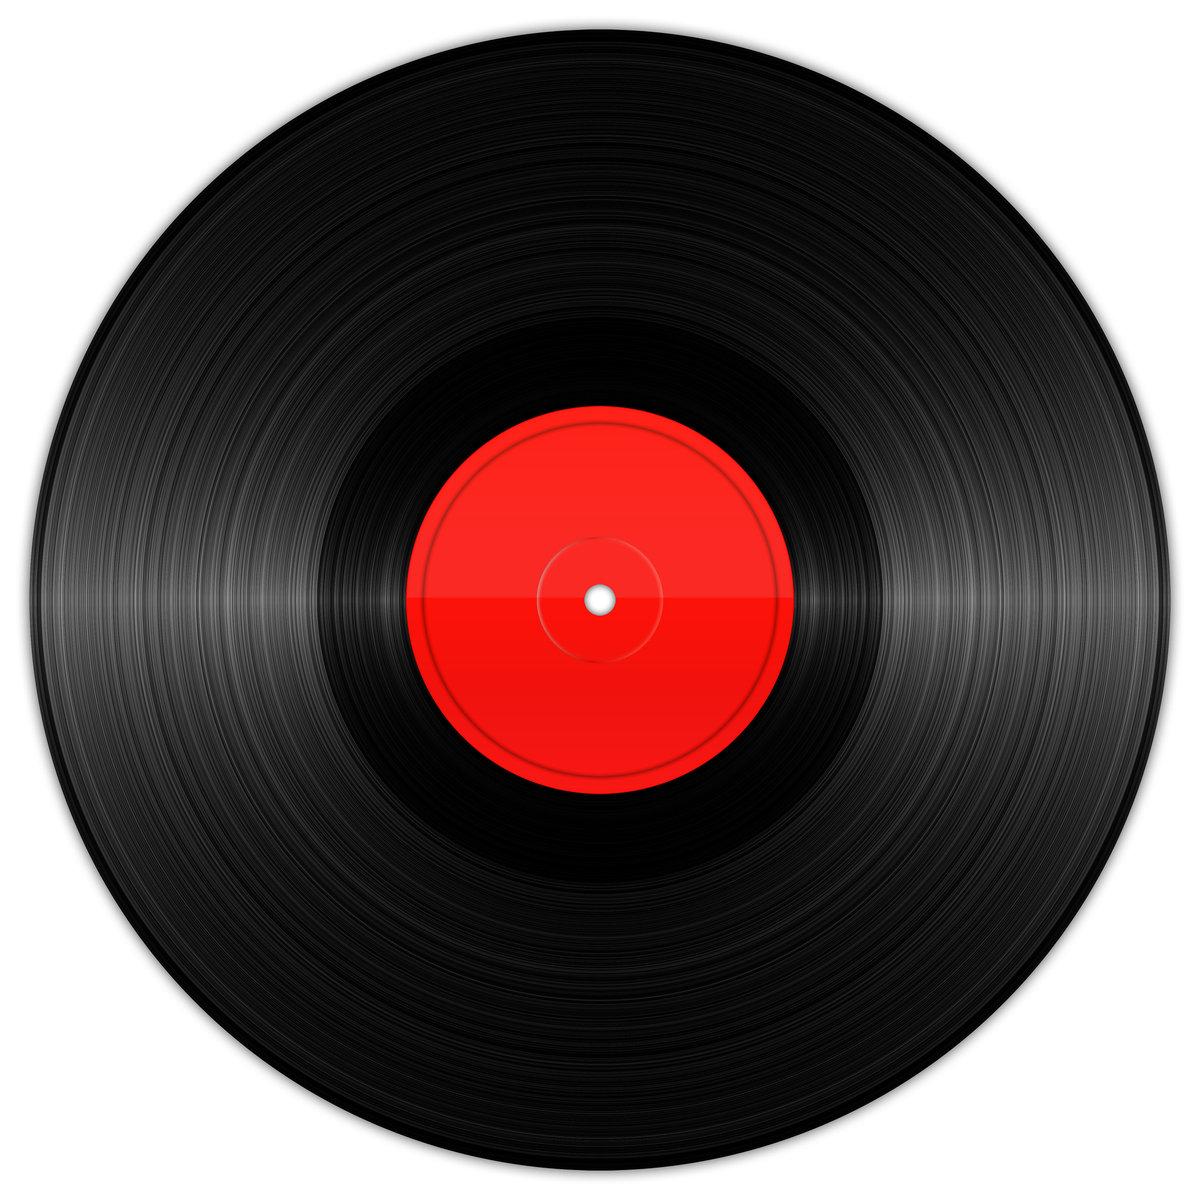 Harmonious Thelonious - 4 tracks EP